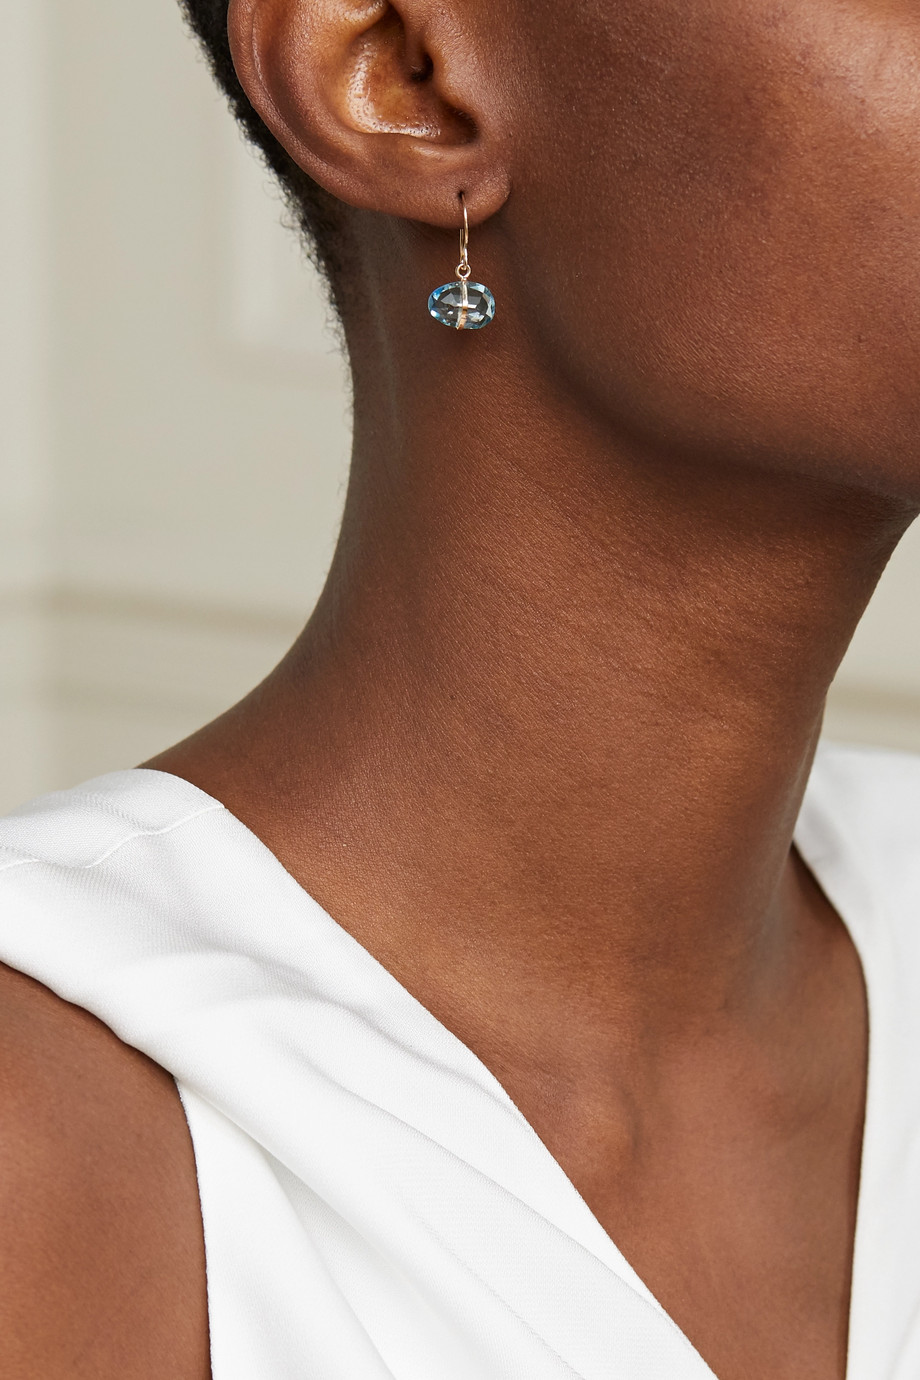 Melissa Joy Manning 14-karat recycled gold topaz earrings